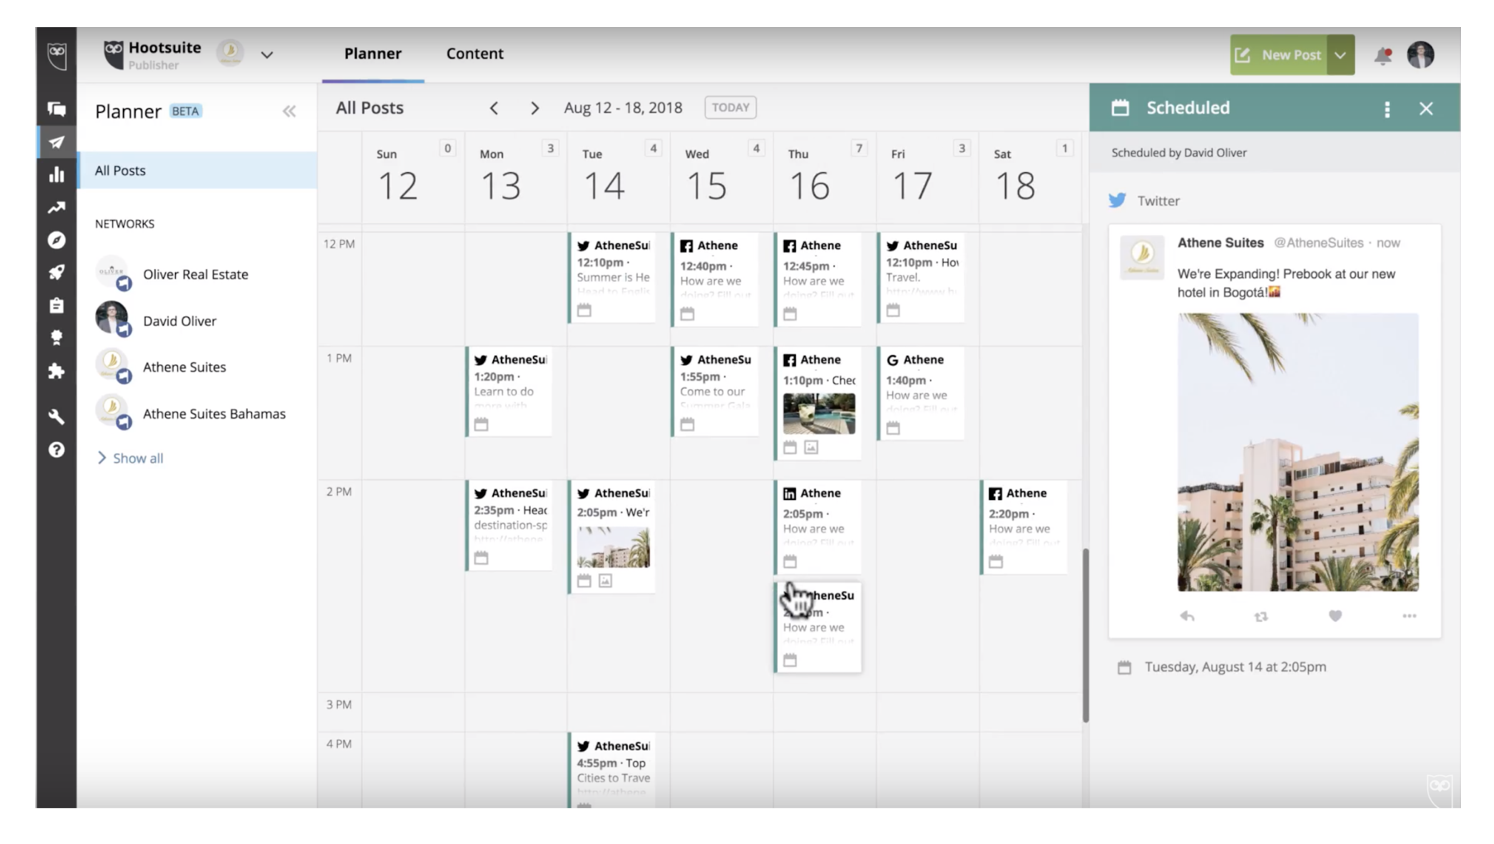 Hootsuite scheduling calendar